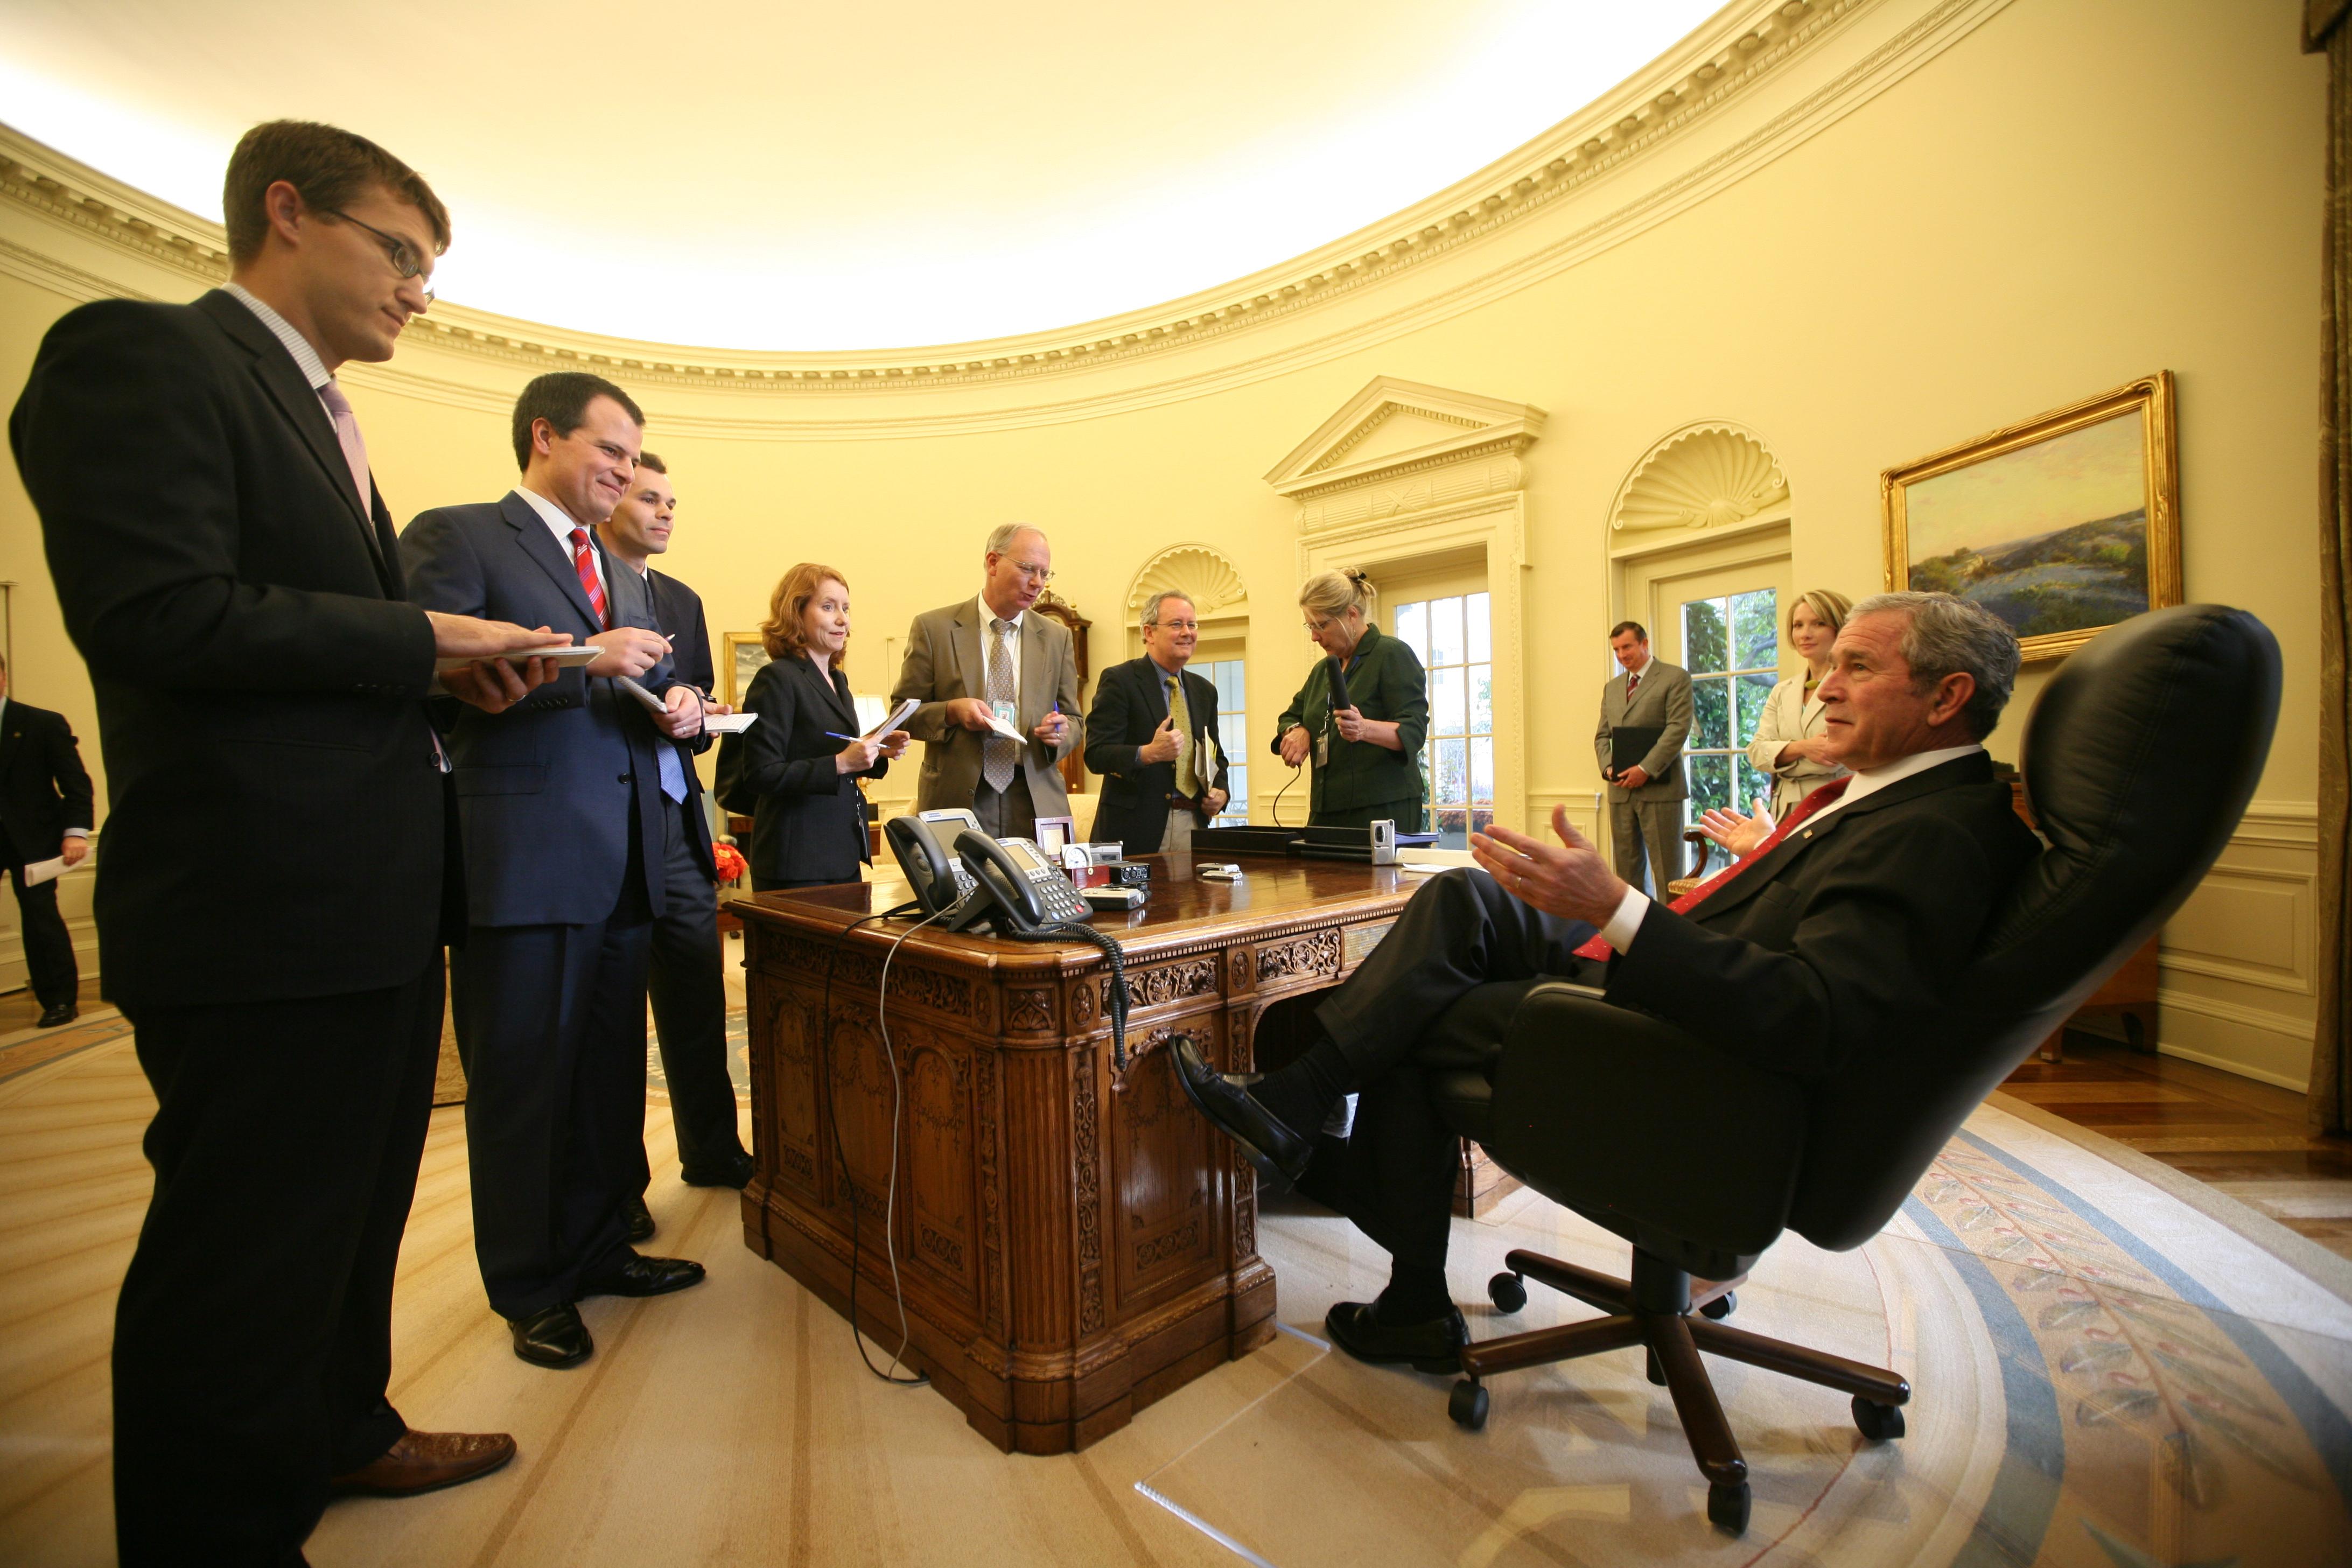 President George W. Bush in the Oval Office - Photo by Joyce Naltchayan (Boghosian)